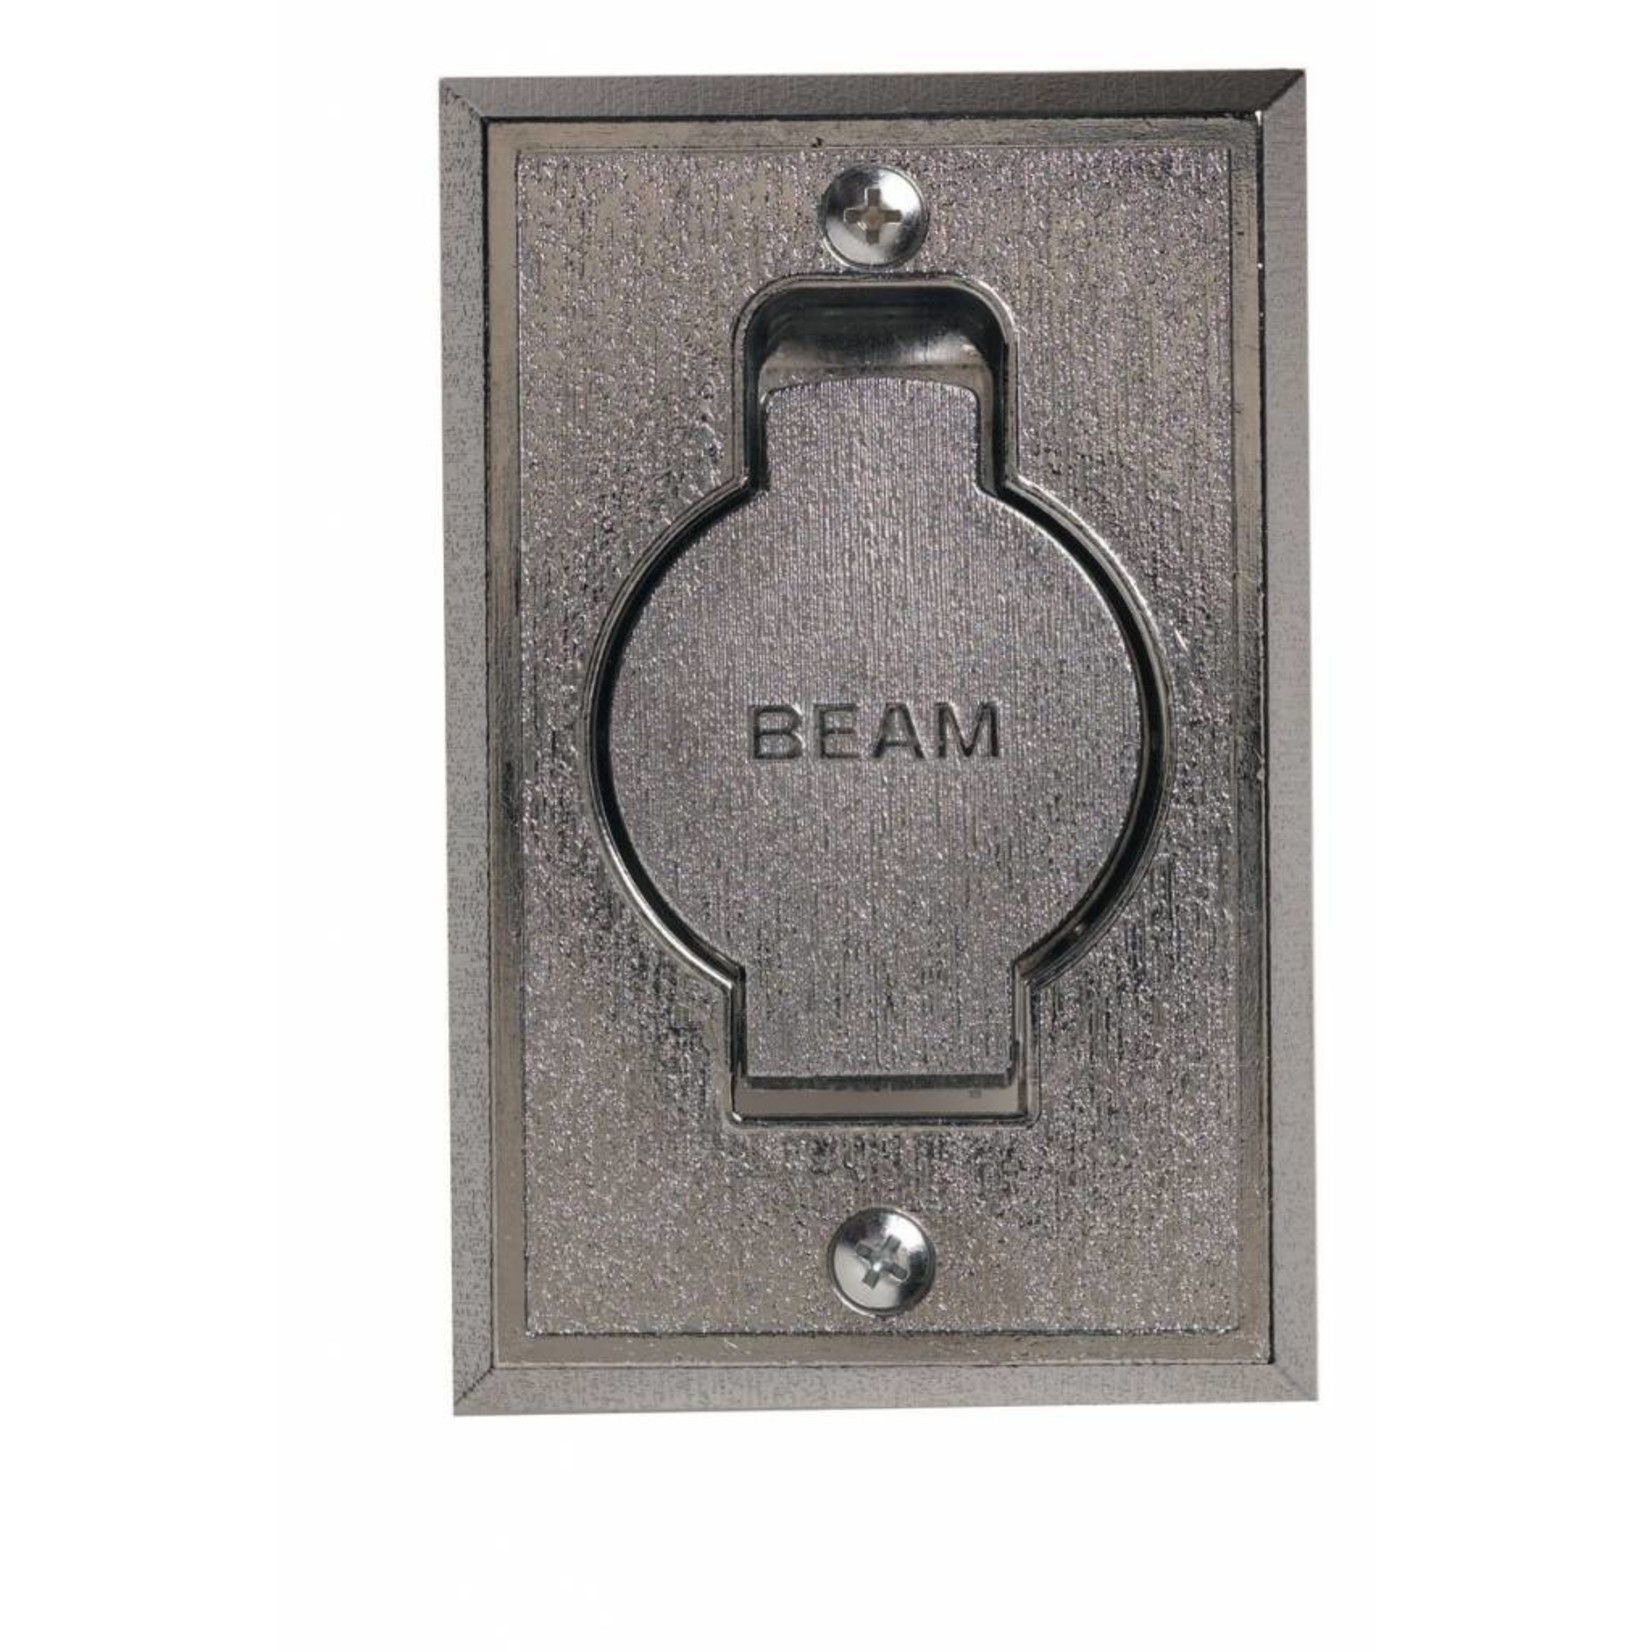 BEAM Beam Metal Valve (Low Volt) - Chrome